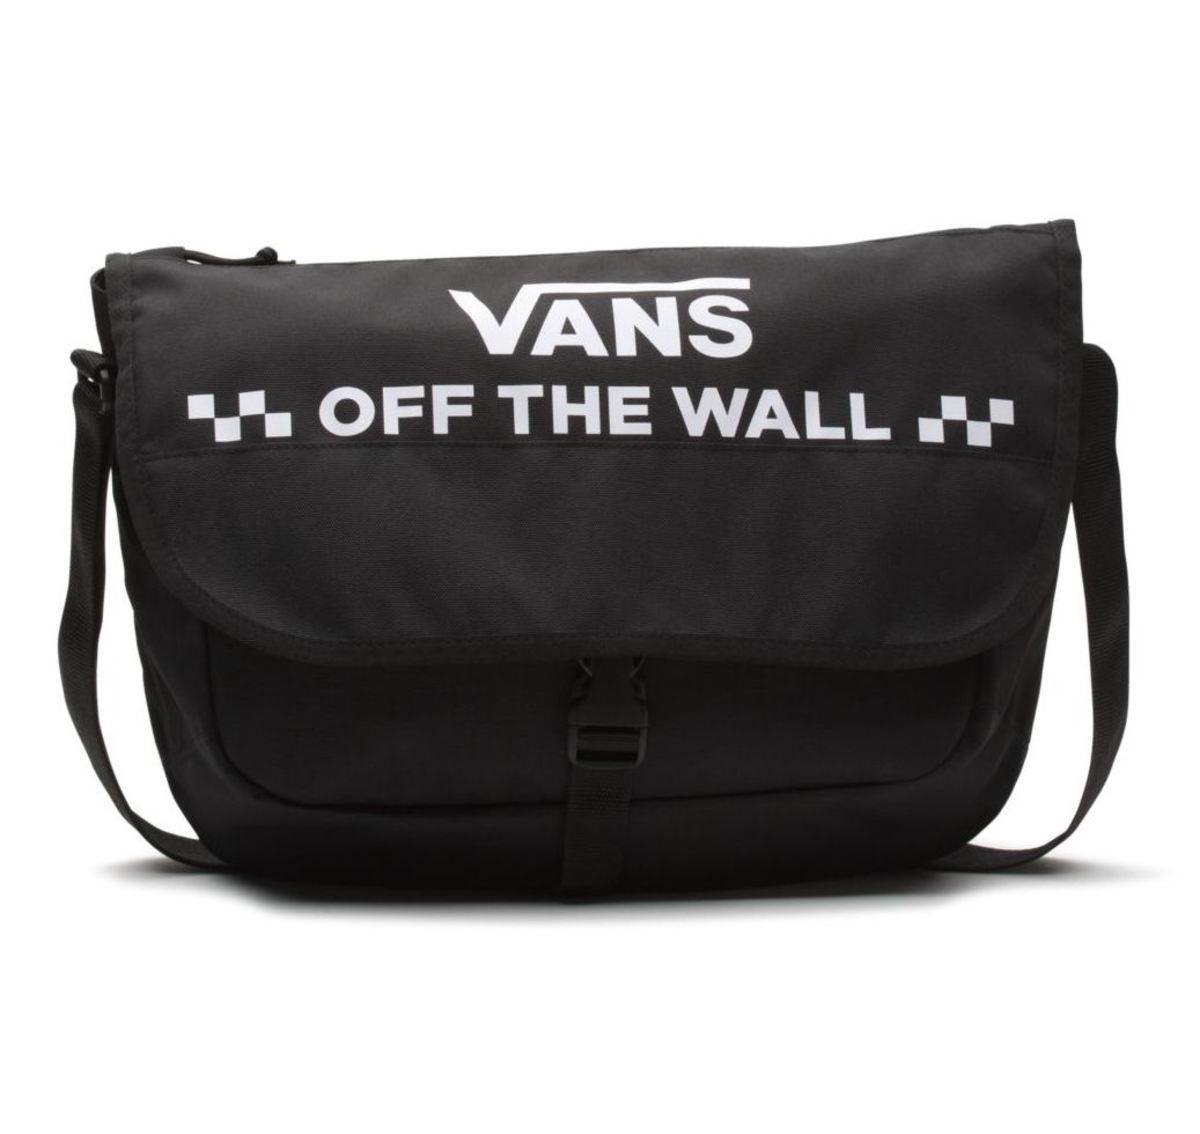 Bag (handbag) VANS - WM COURIER MESSENGER - Black - VN0A3NG6BLK1 ...